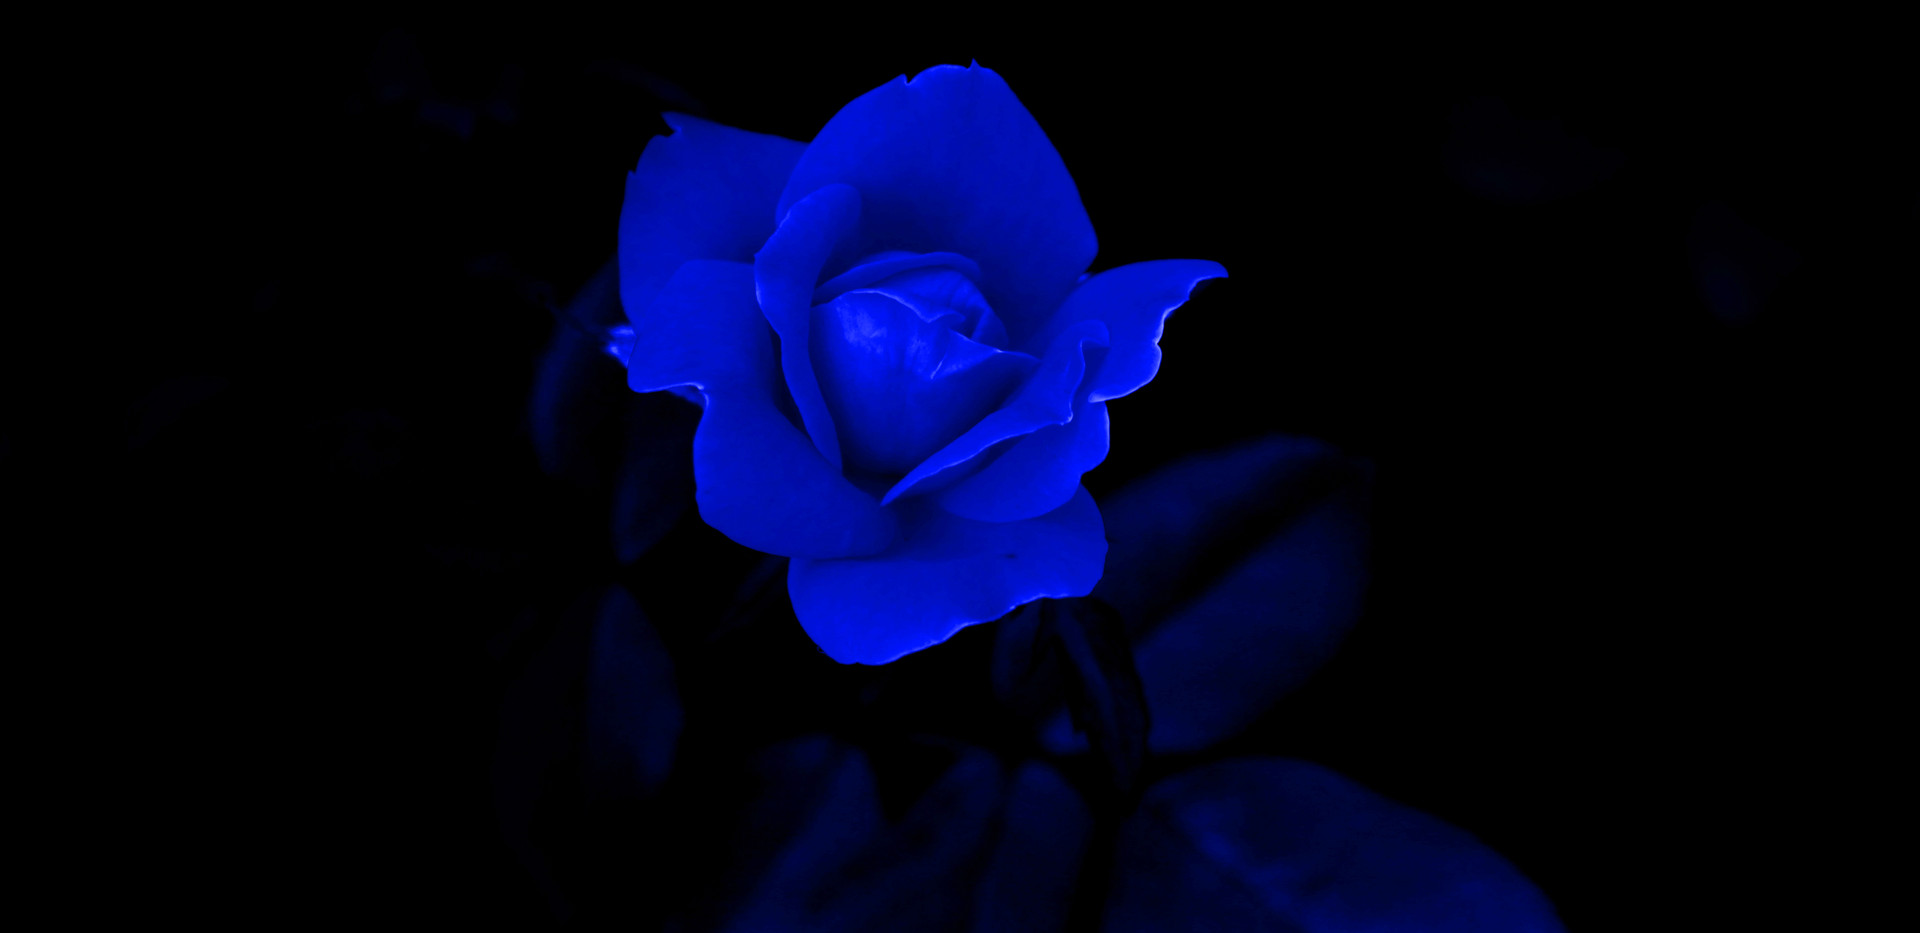 Mary Ann blue flower 1062 - Copy.JPG